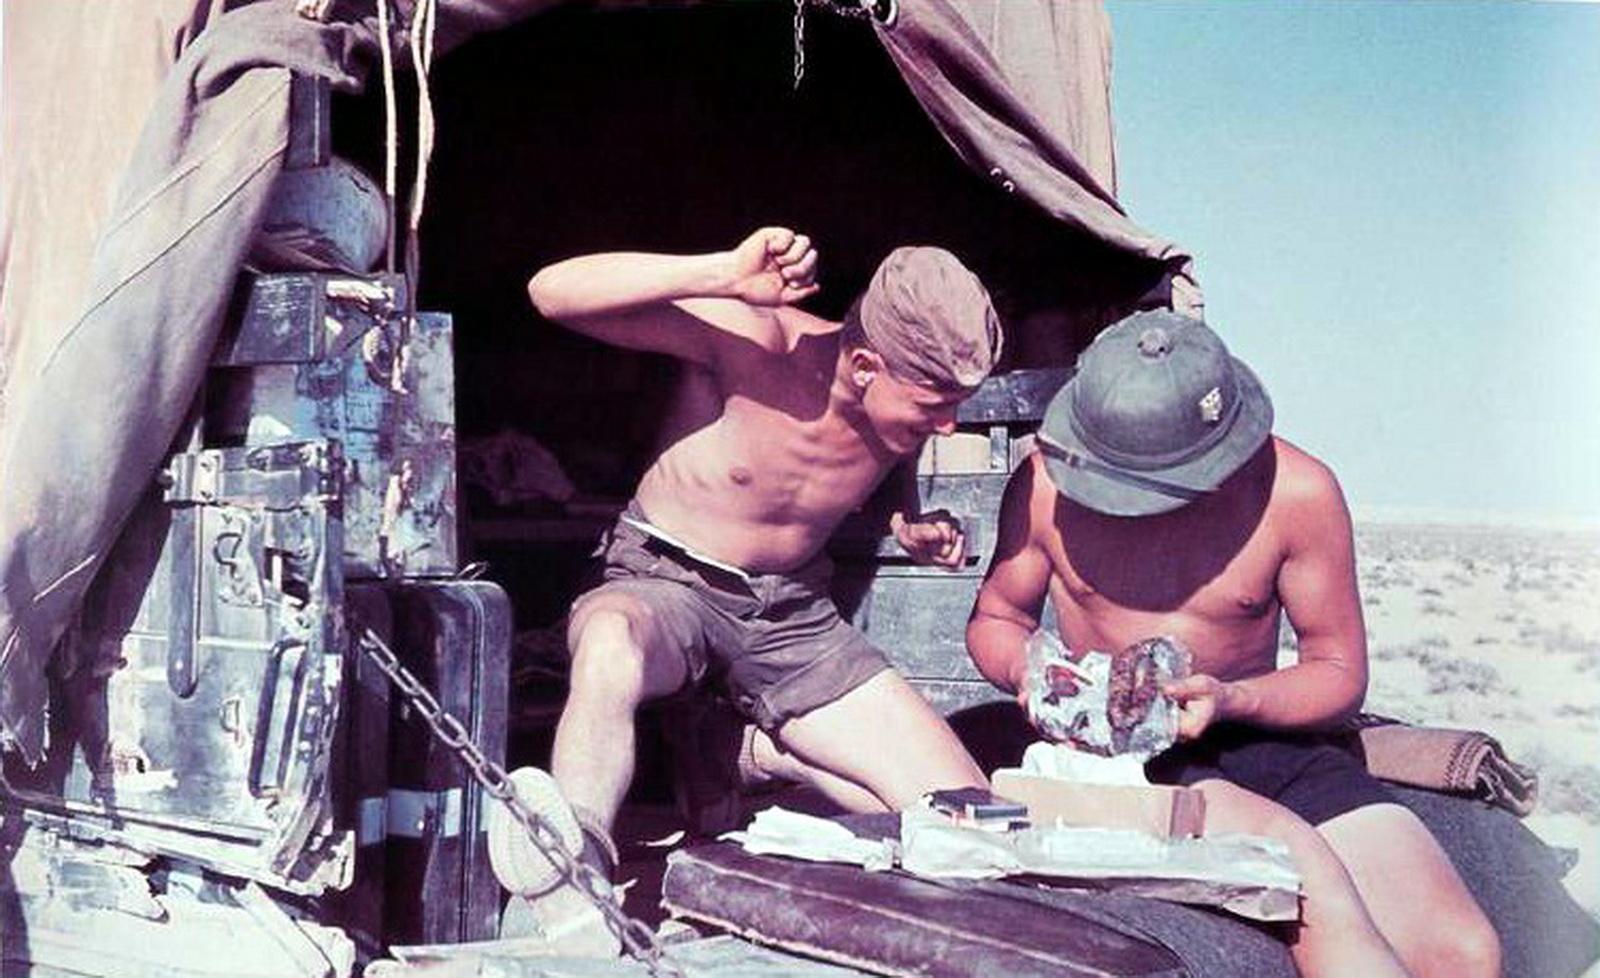 color afrikakorps soldiers tent desert africa naked.jpg